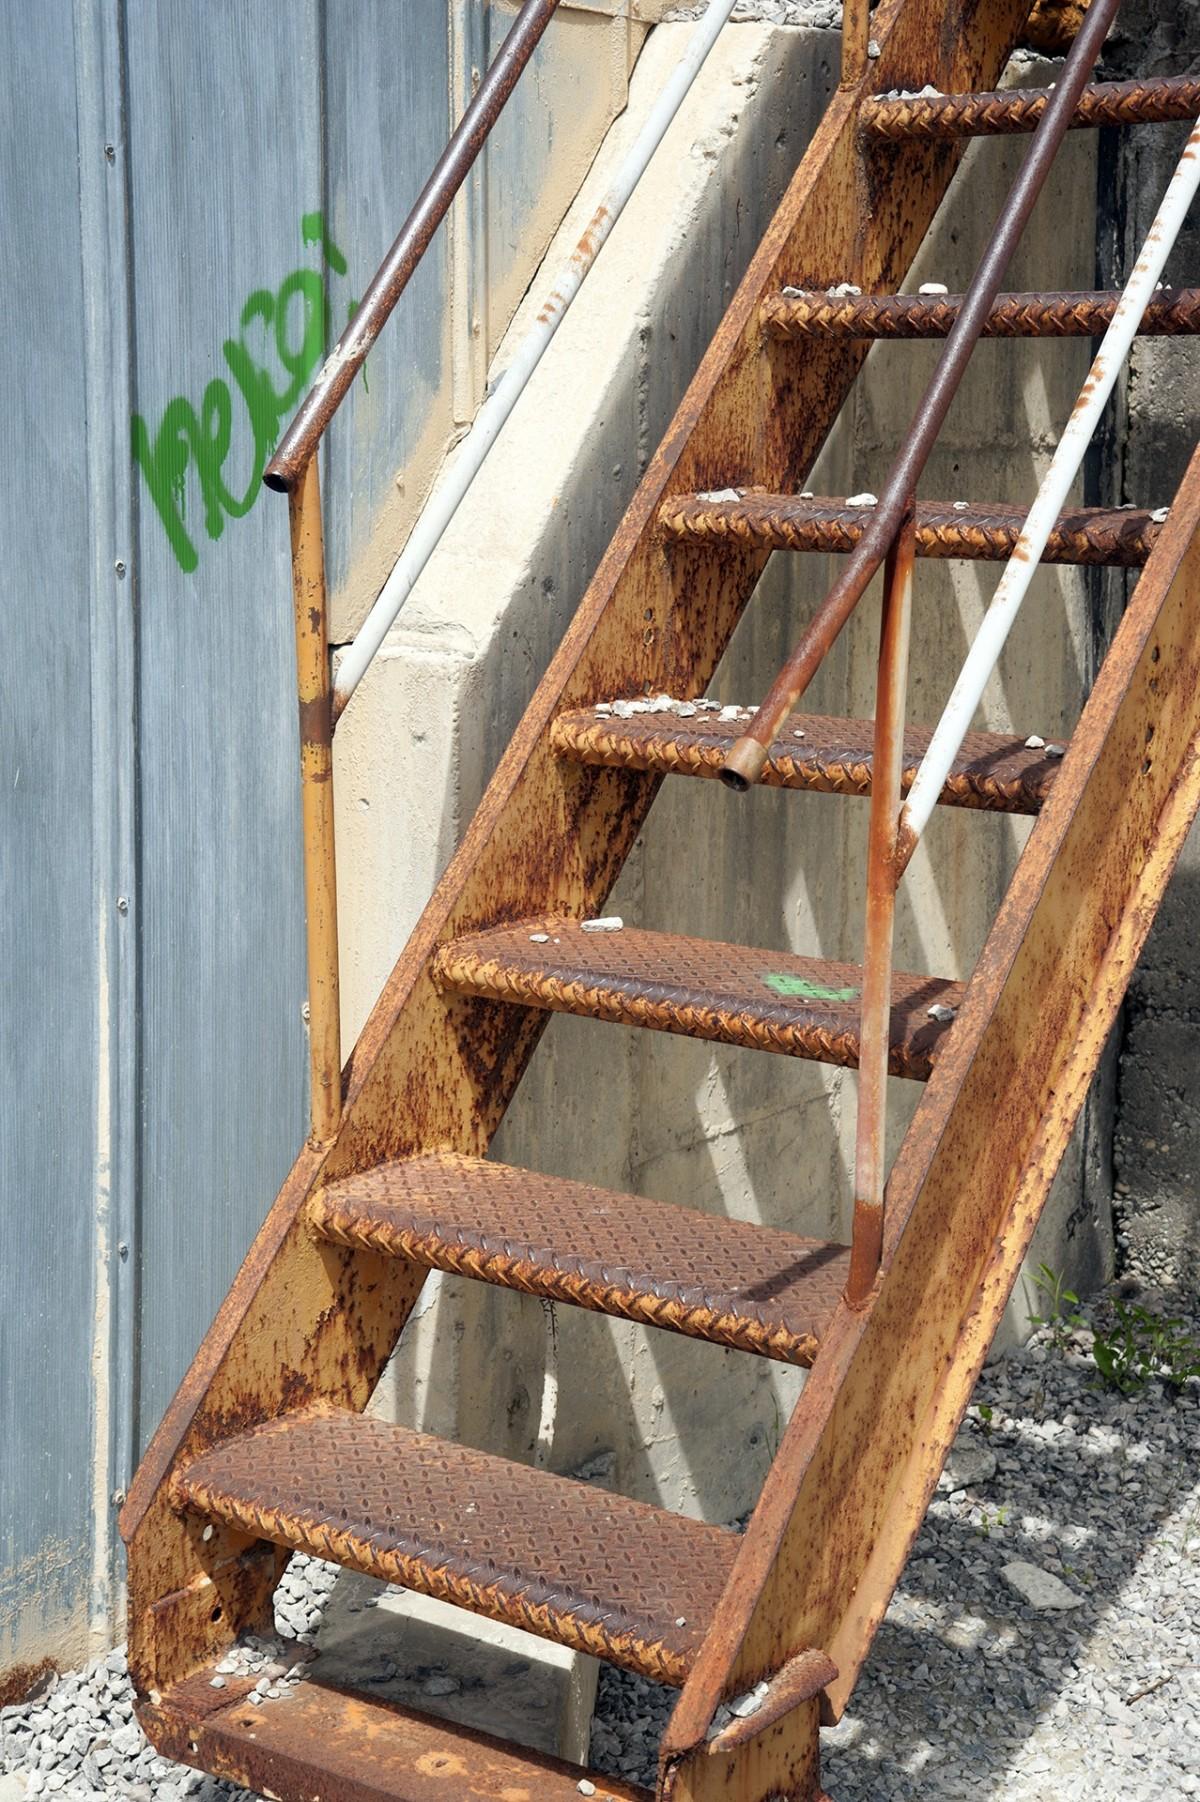 Fotos gratis al aire libre madera ventana urbano for Escalera de madera al aire libre precio